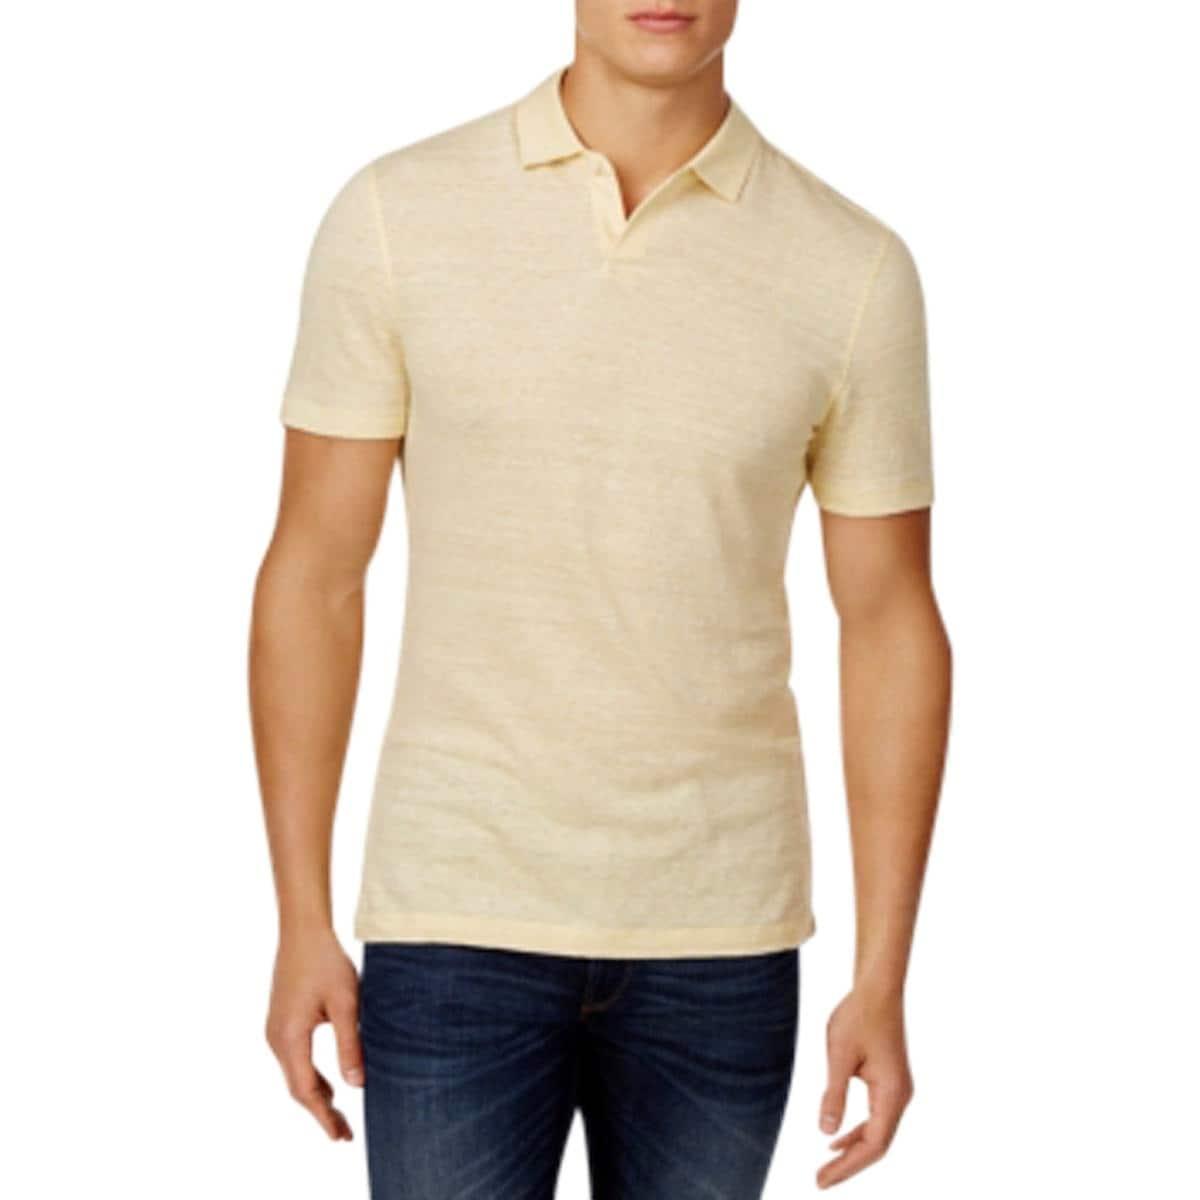 Shop Michael Kors Mens Polo Shirt Linen Blend Heathered L Free